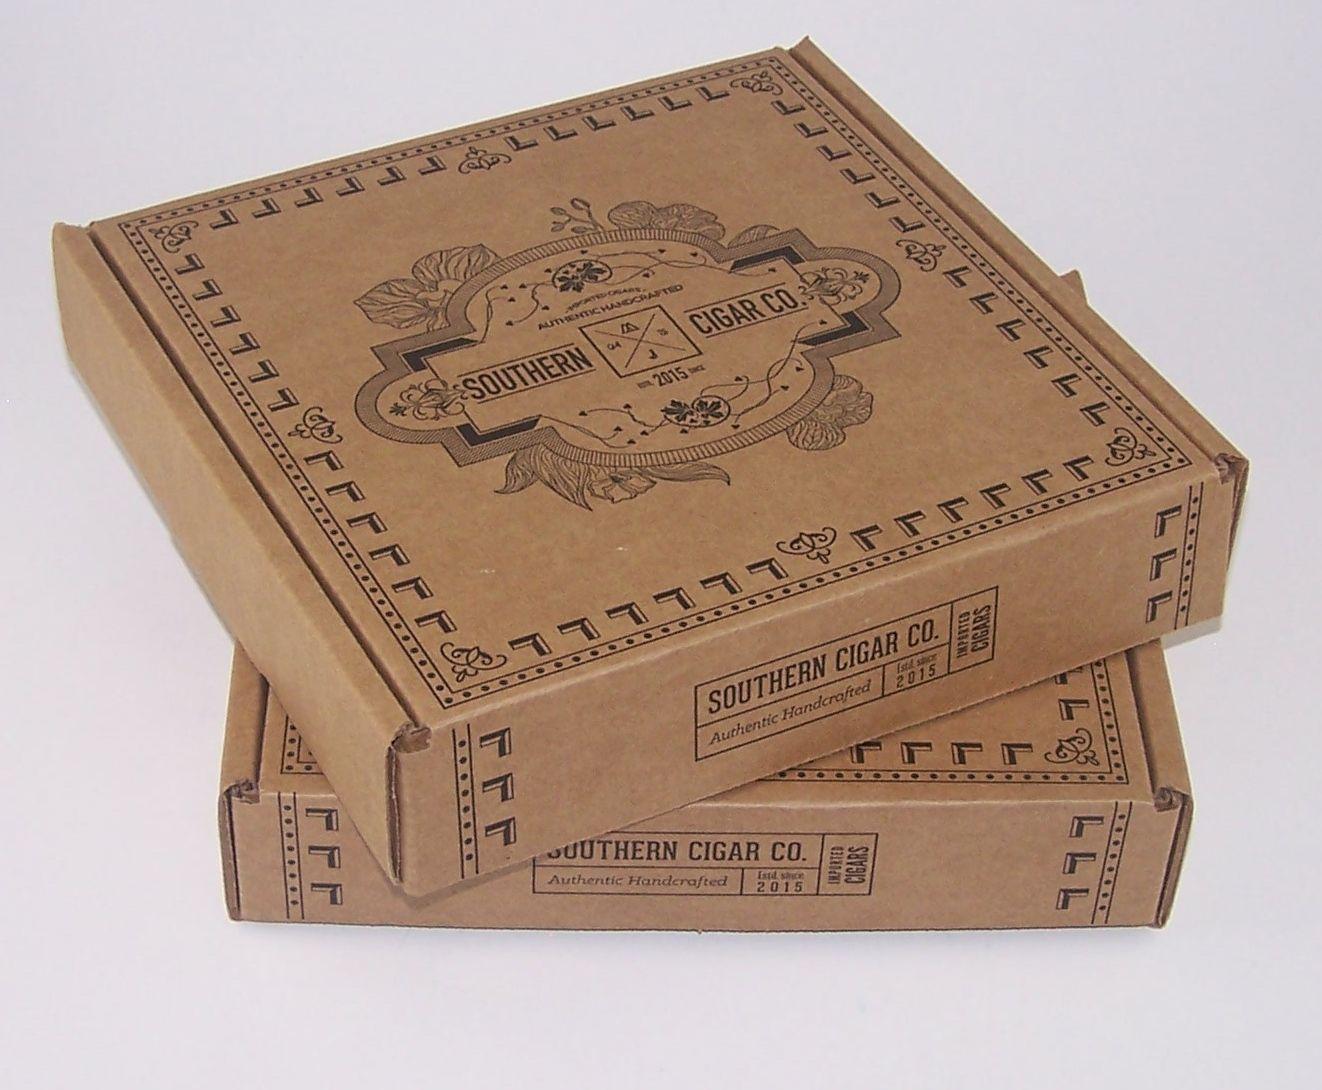 Southern Cigar Company Box Design